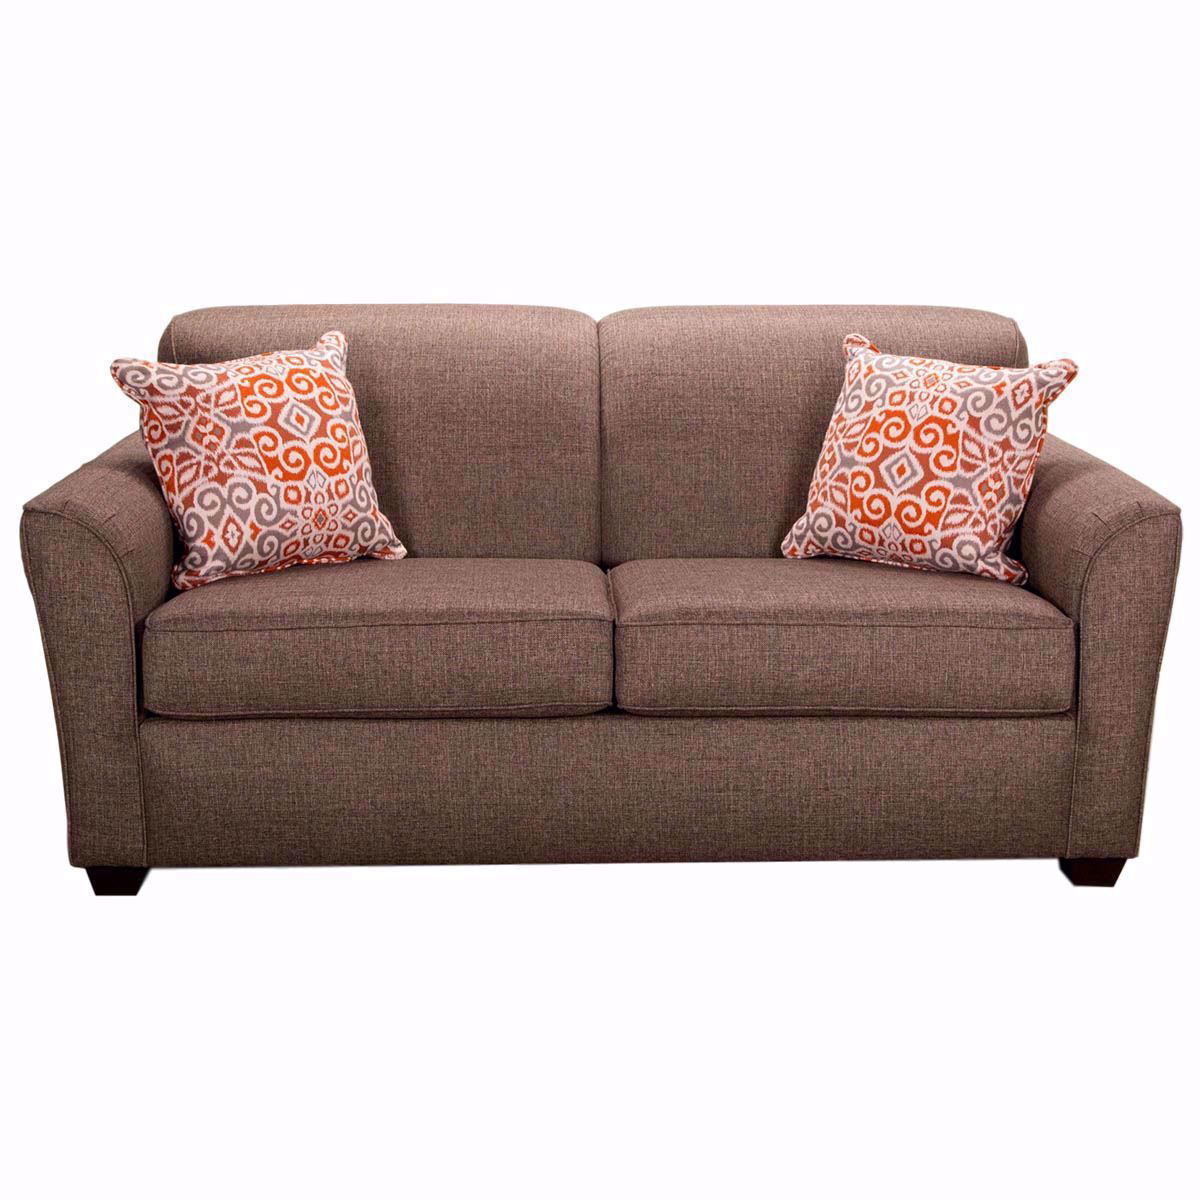 Picture of Smyrna Full Sleeper Sofa